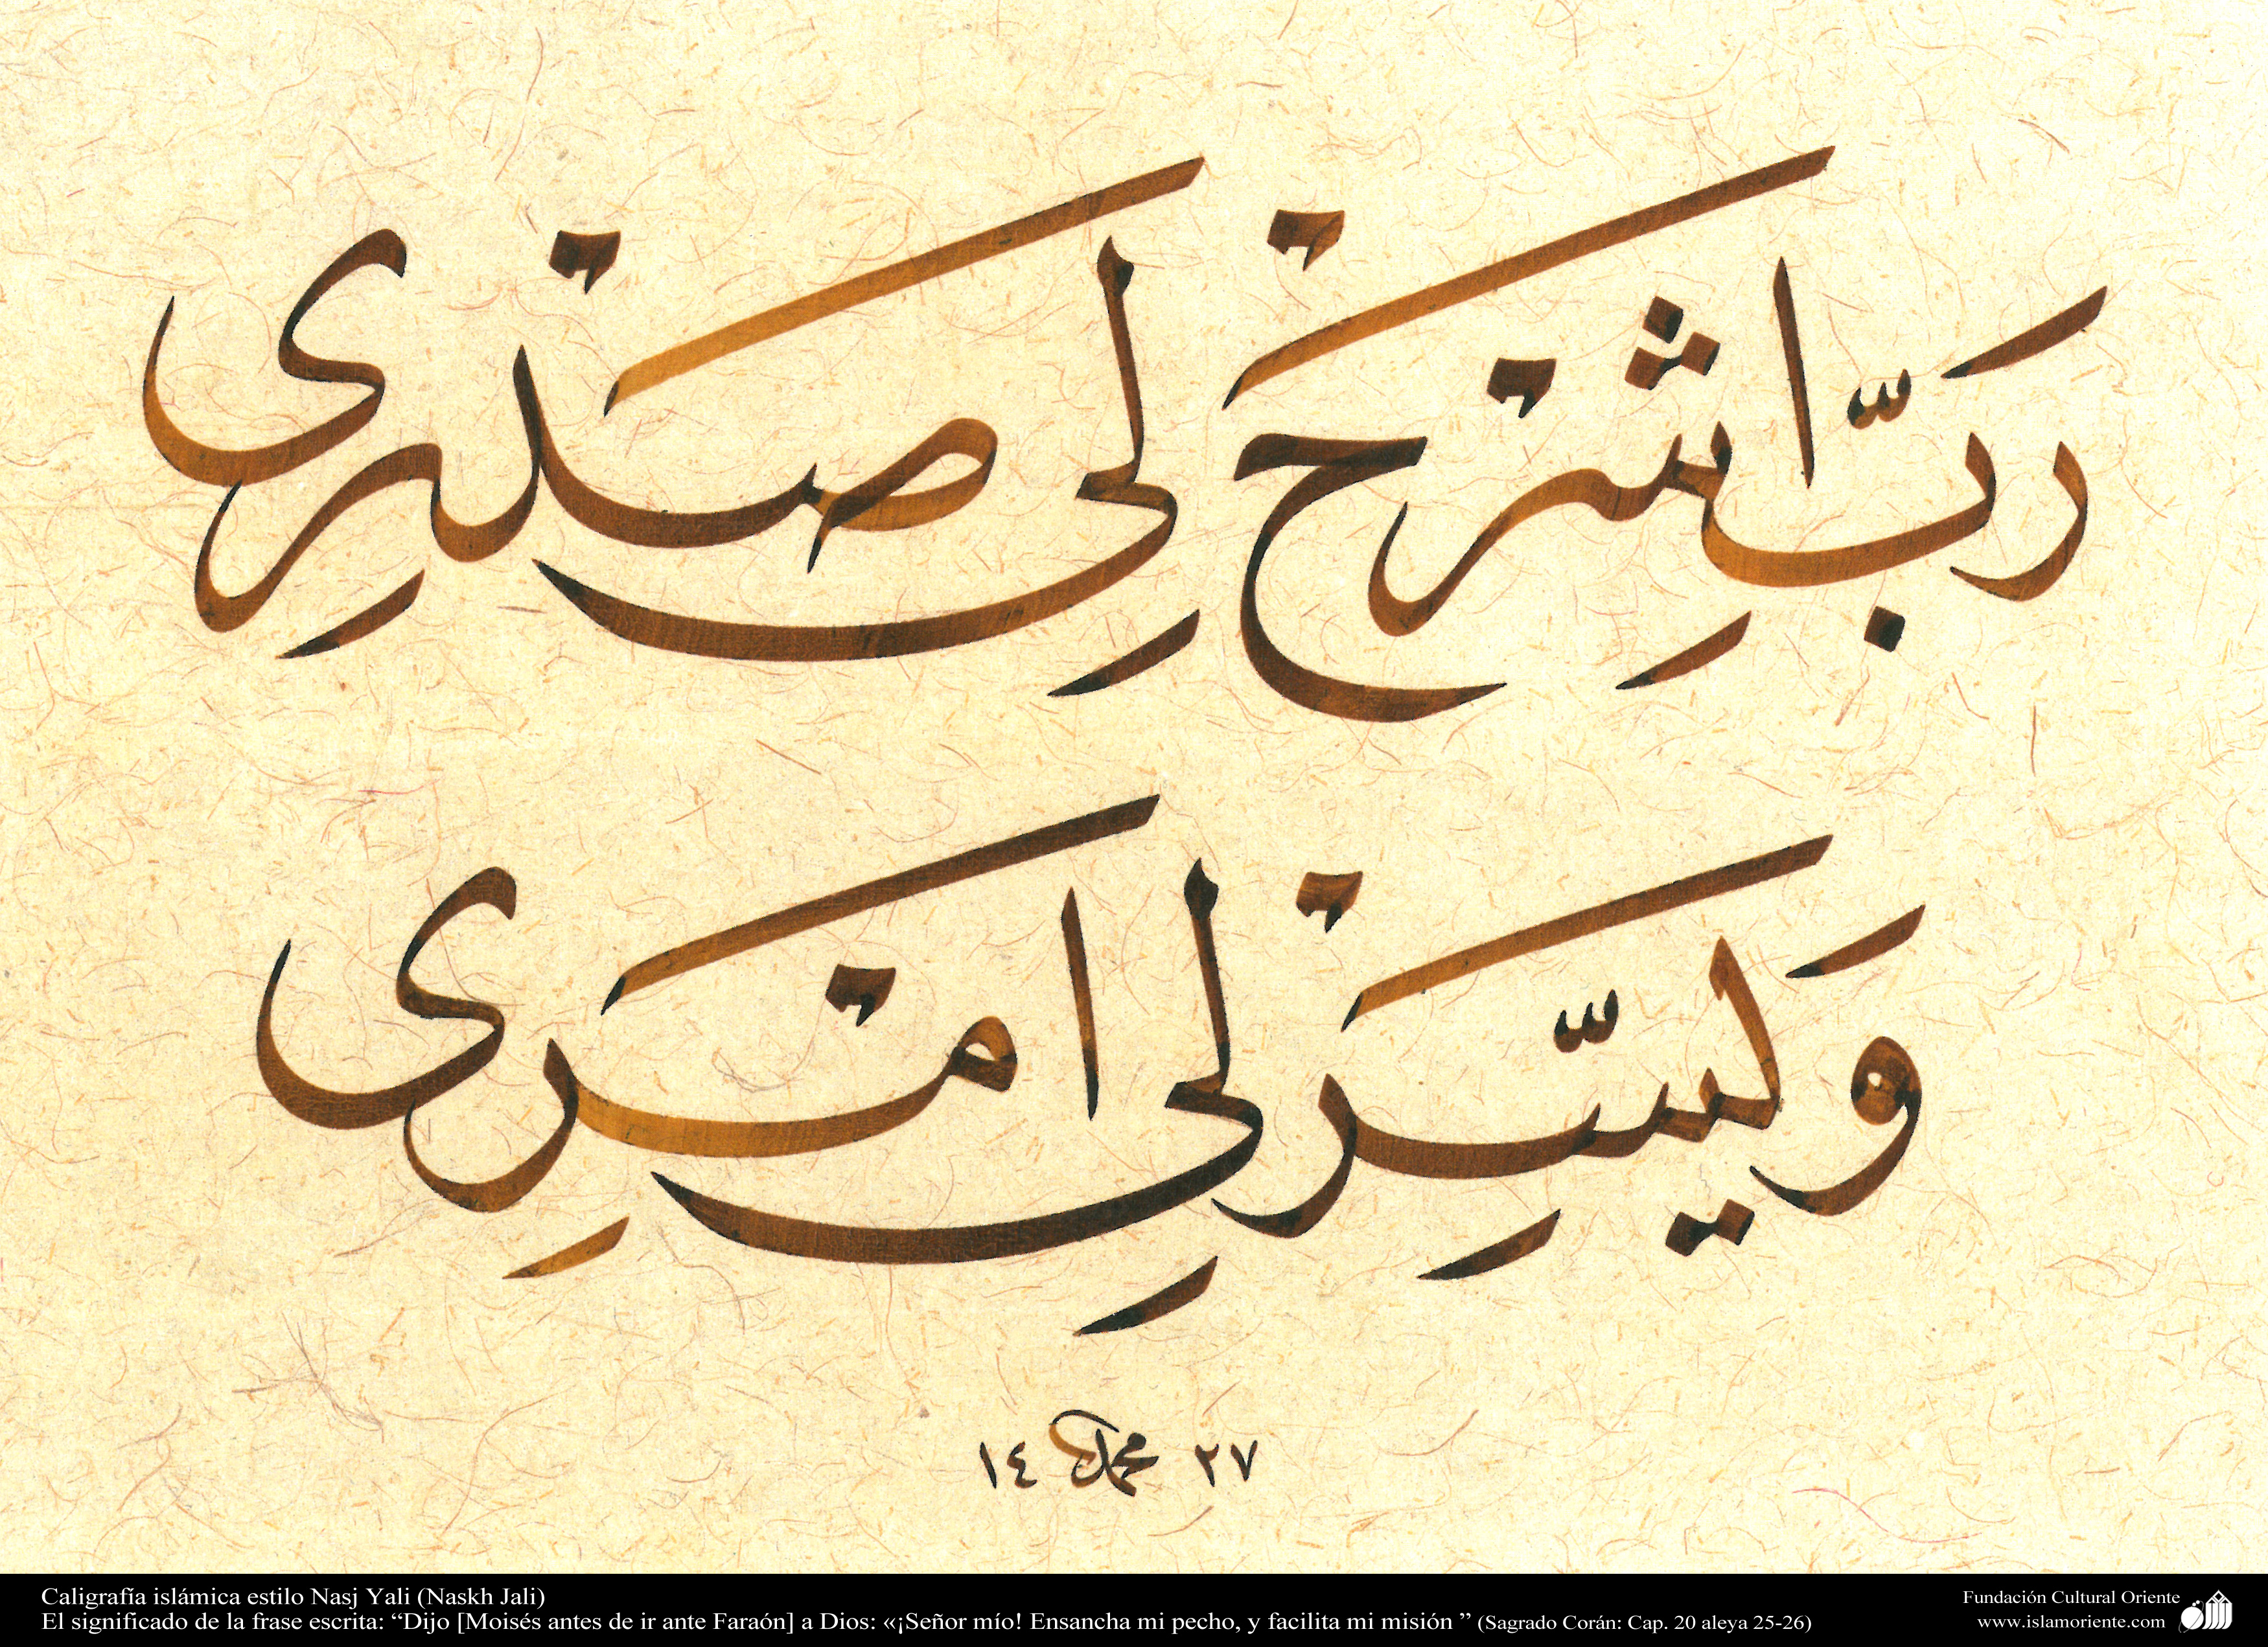 Islamic Calligraphy Naskh Style Said Moses Before